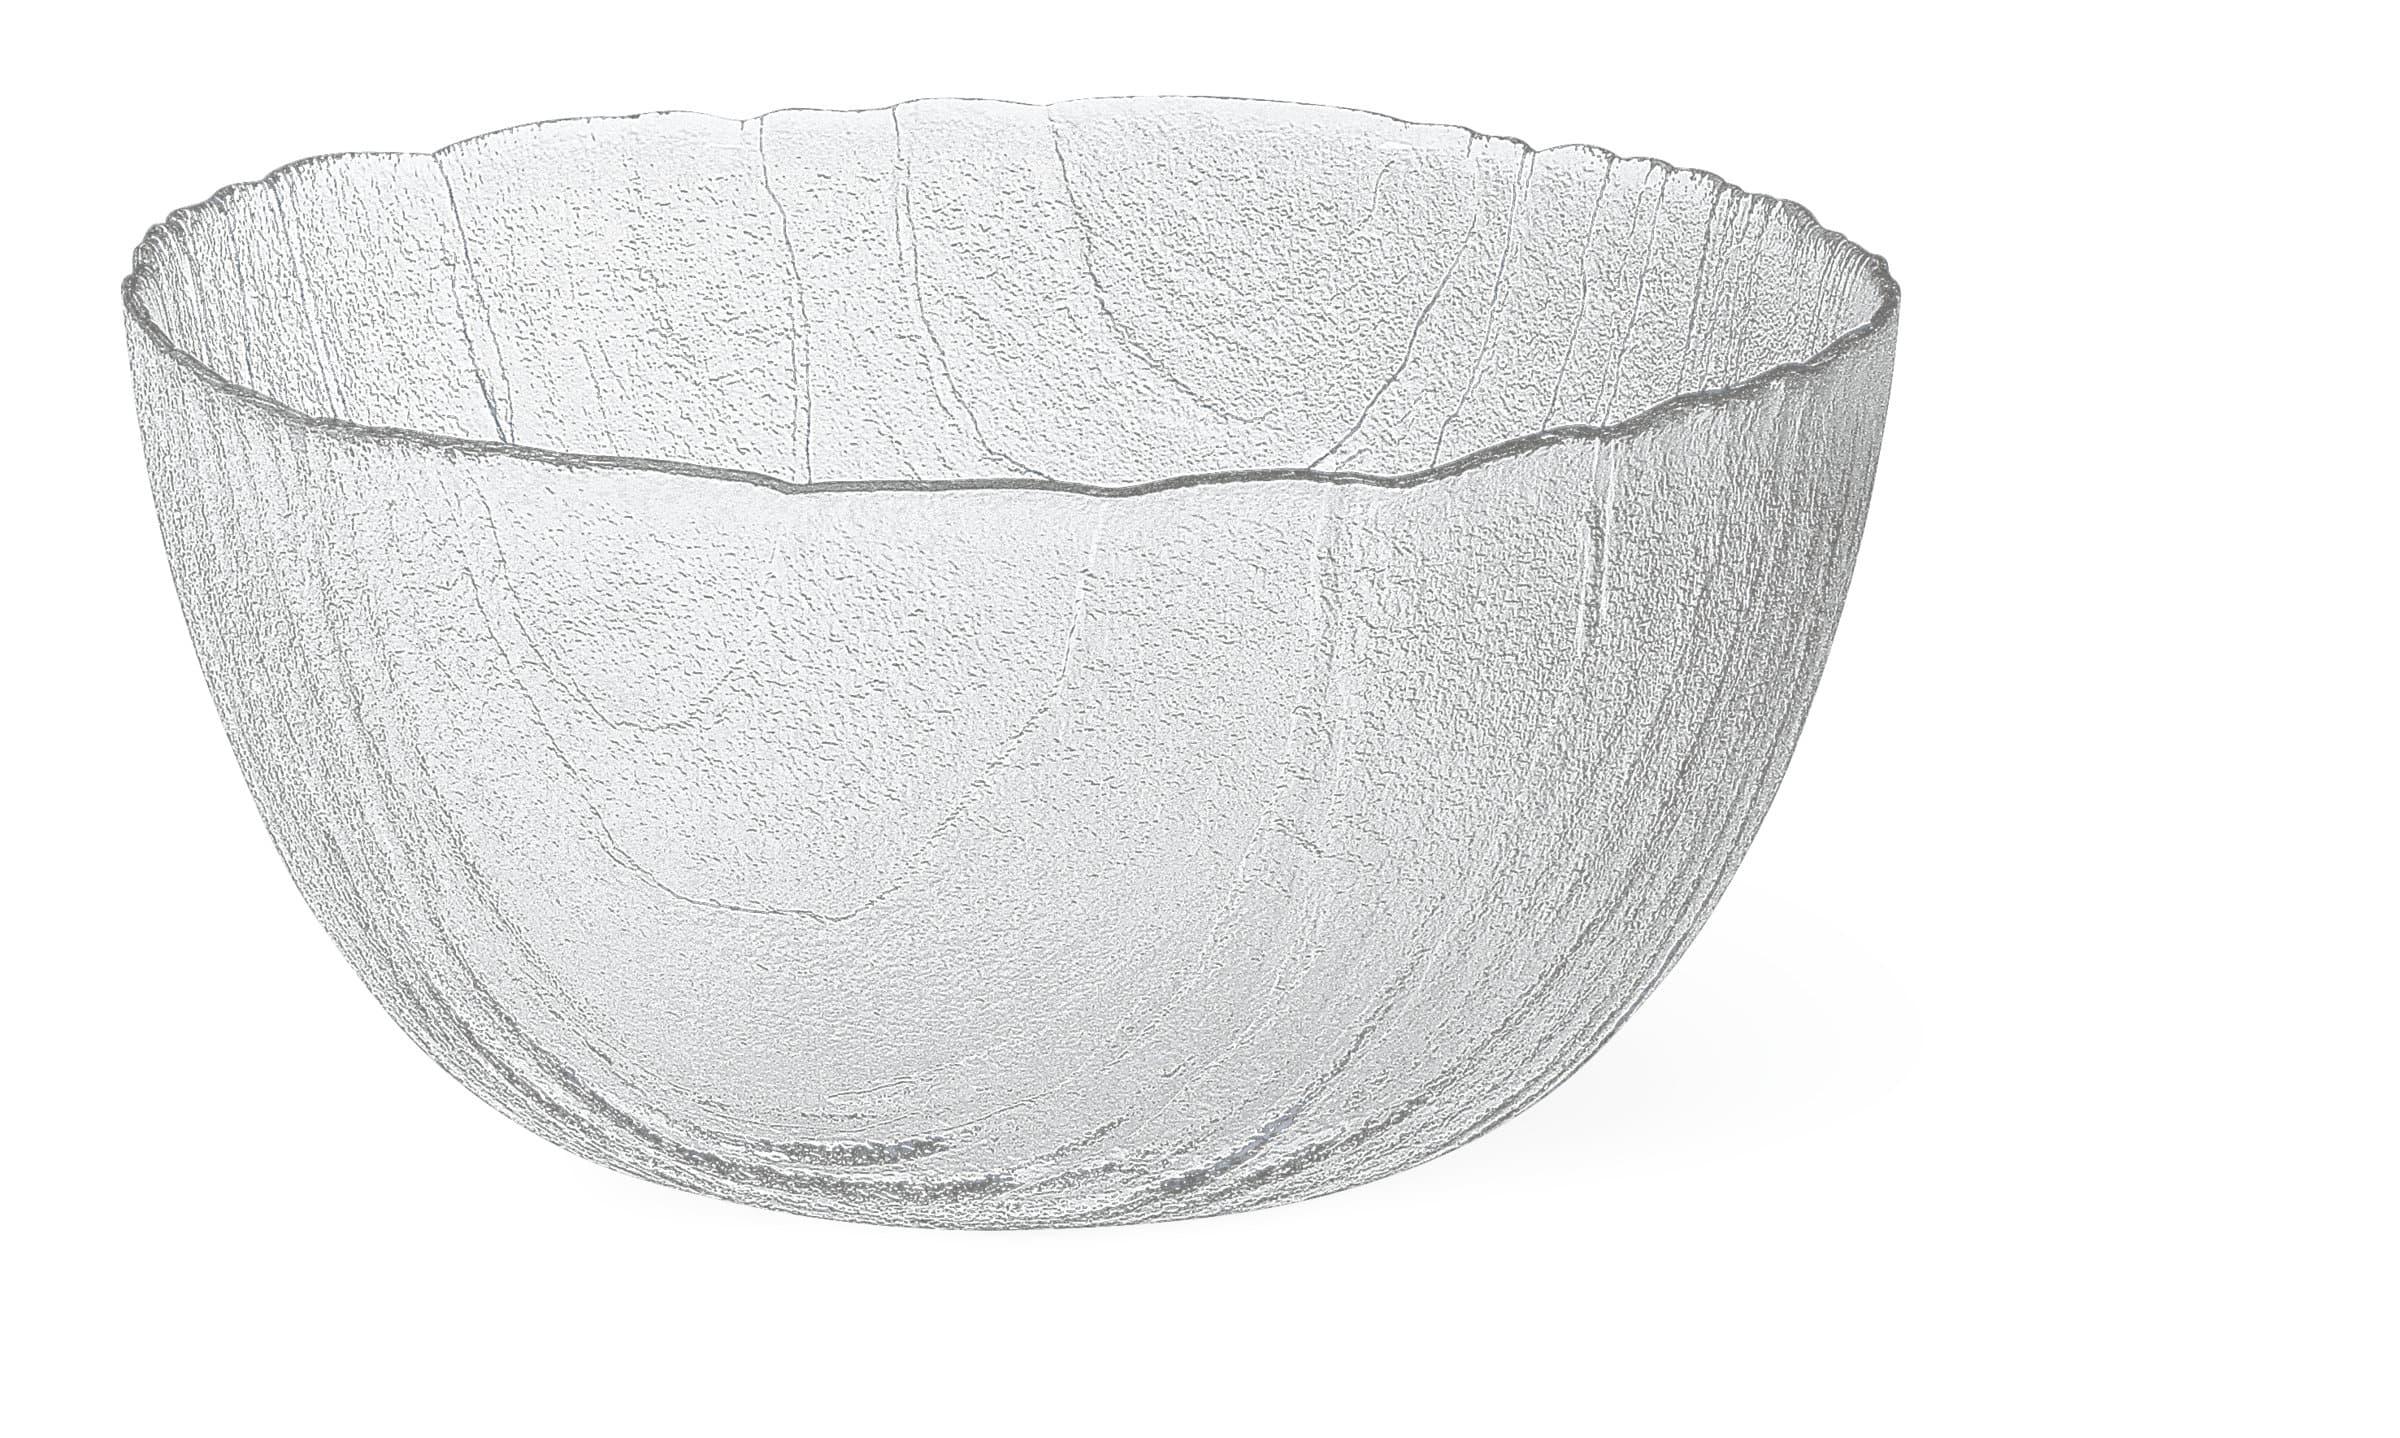 Cucina & Tavola VOLCANO Schüssel 20cm